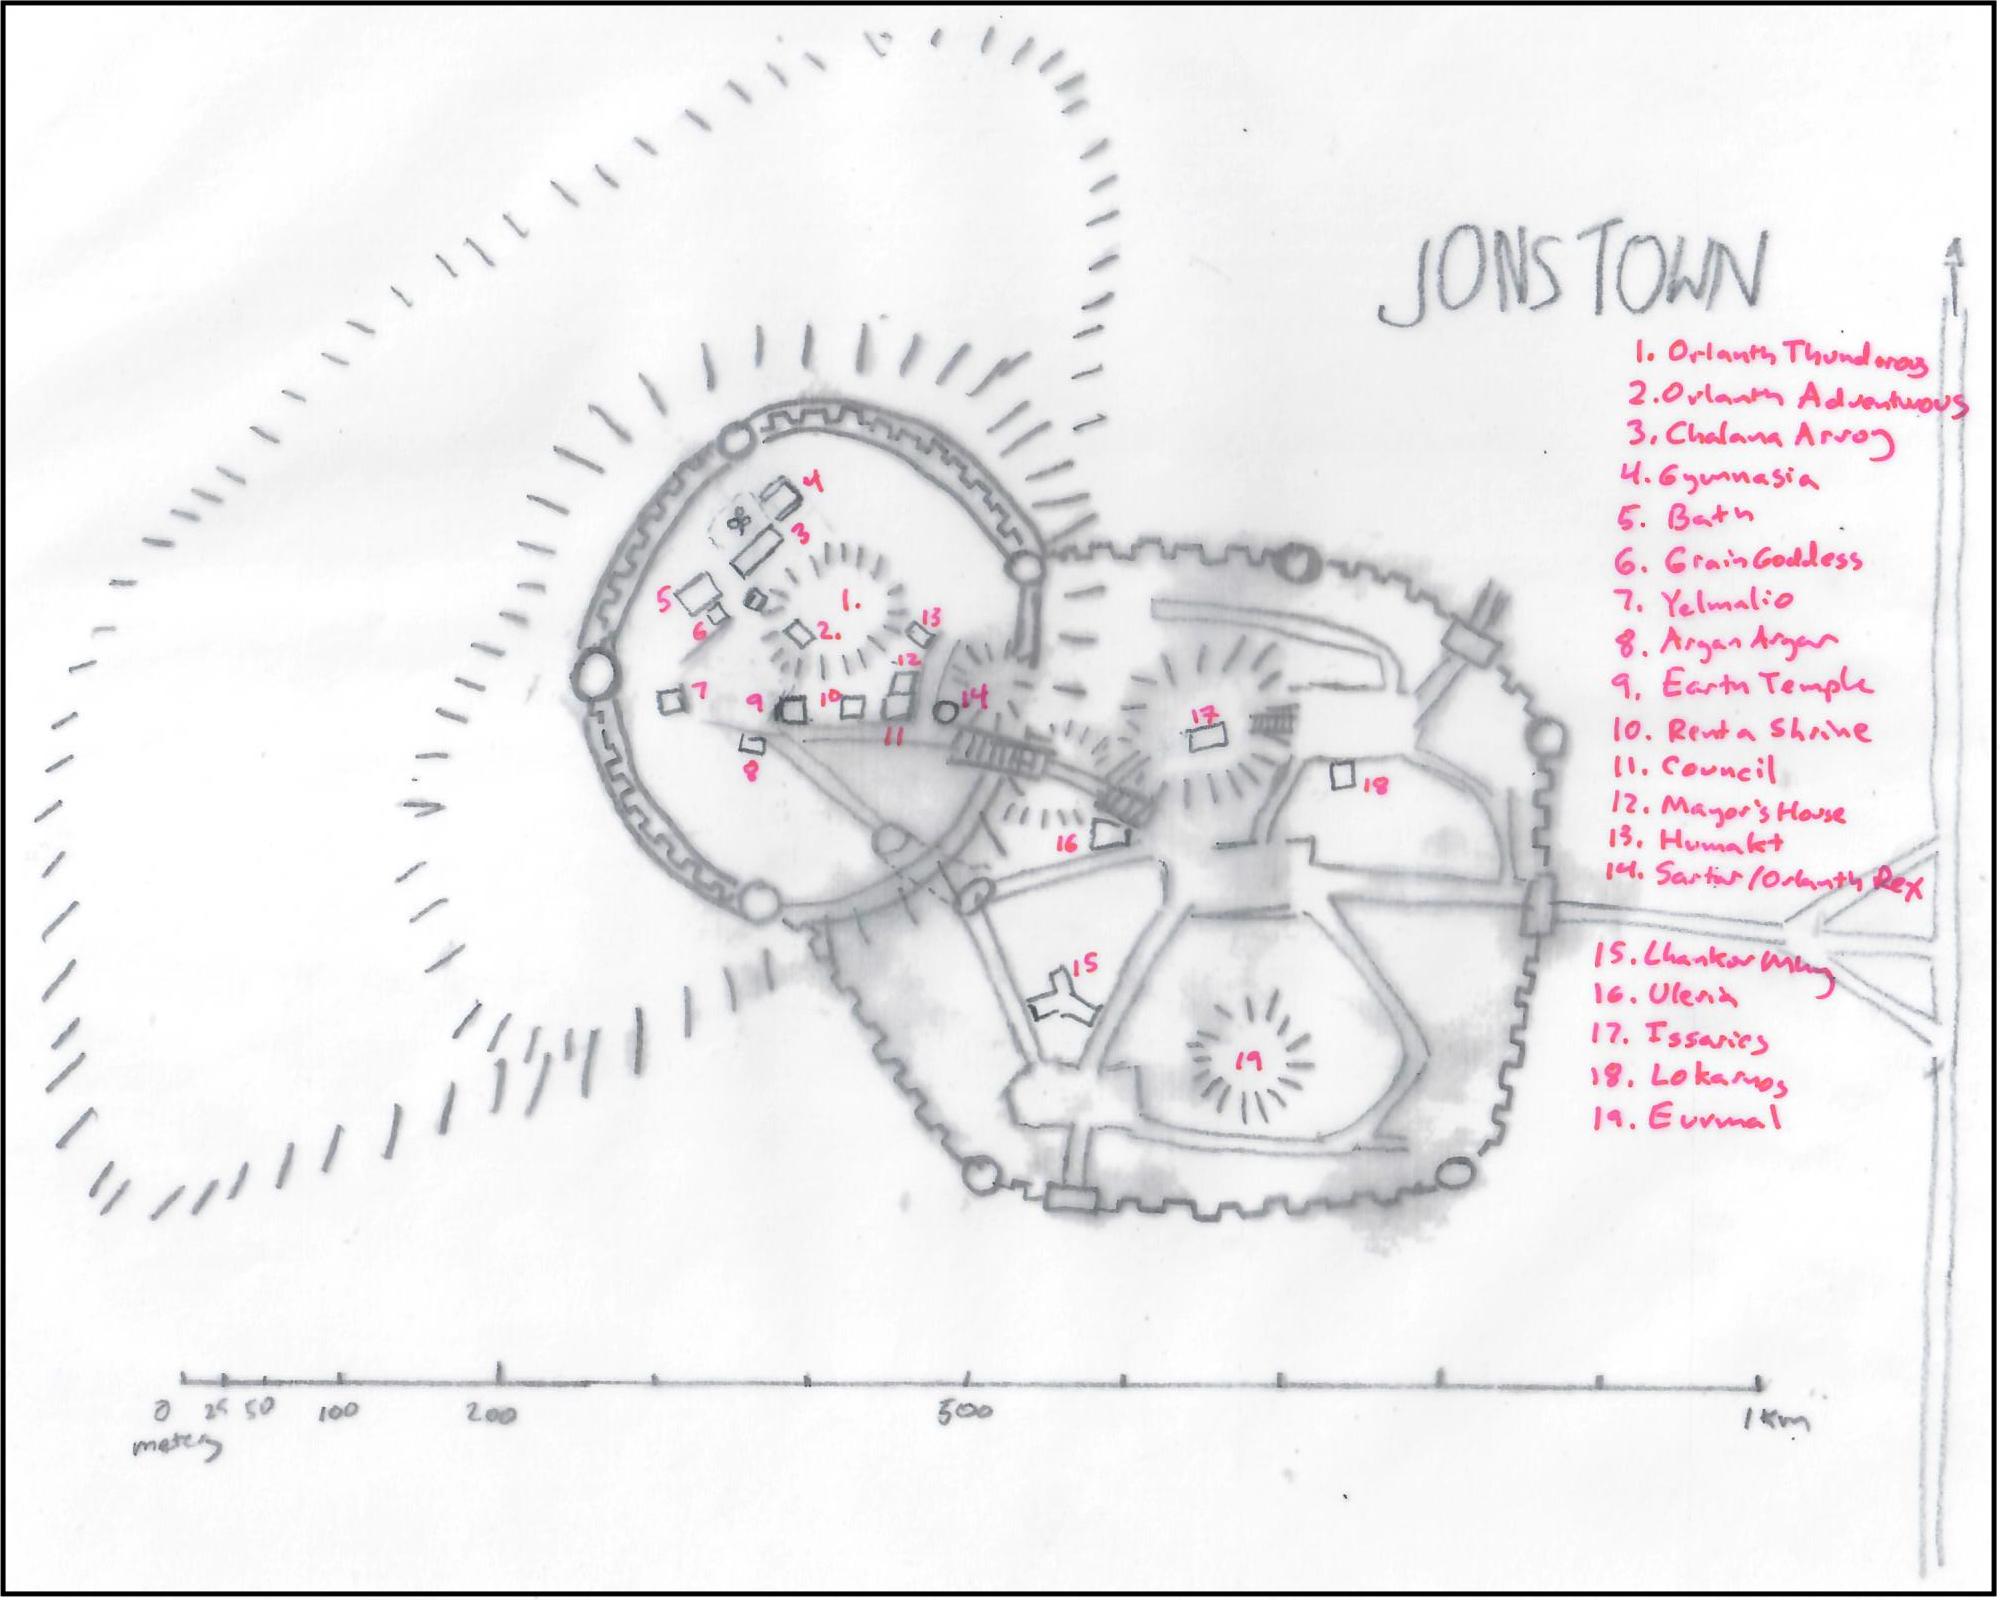 jonstown-temples-labeled.jpg